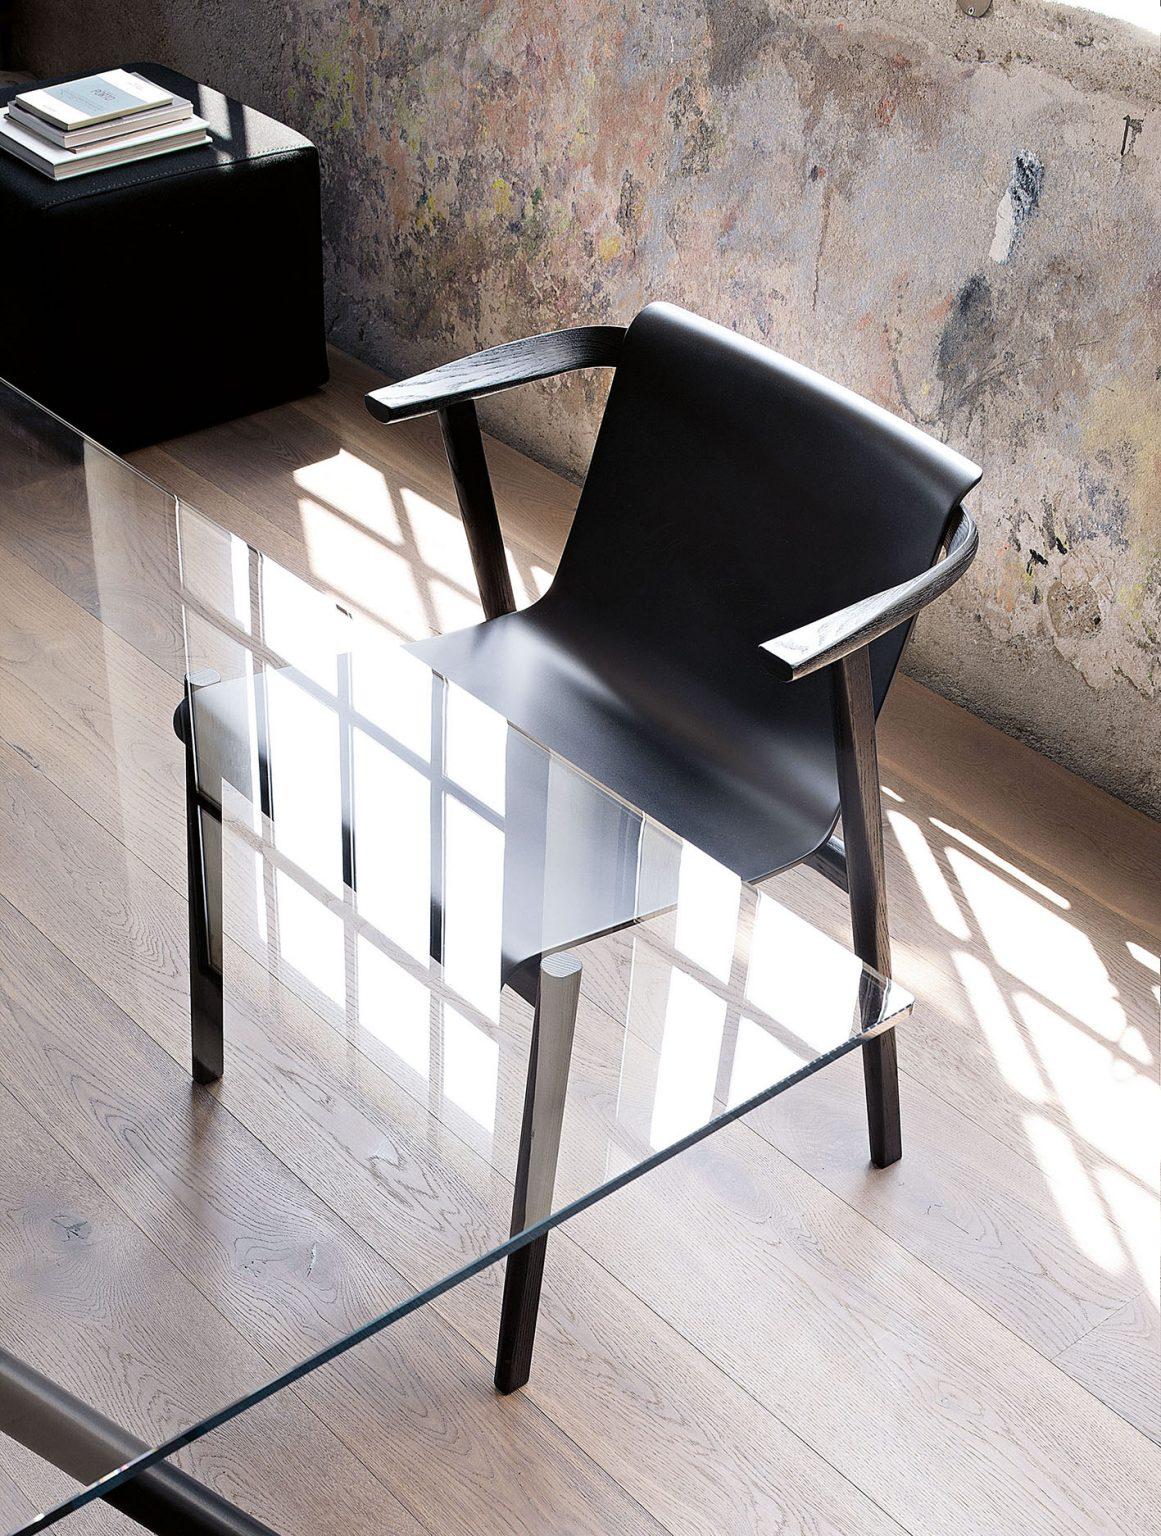 Biennale Interieur - Belgium's leading design and interior event - Lema-bai-lu-chair-neri-hu-1.jpg